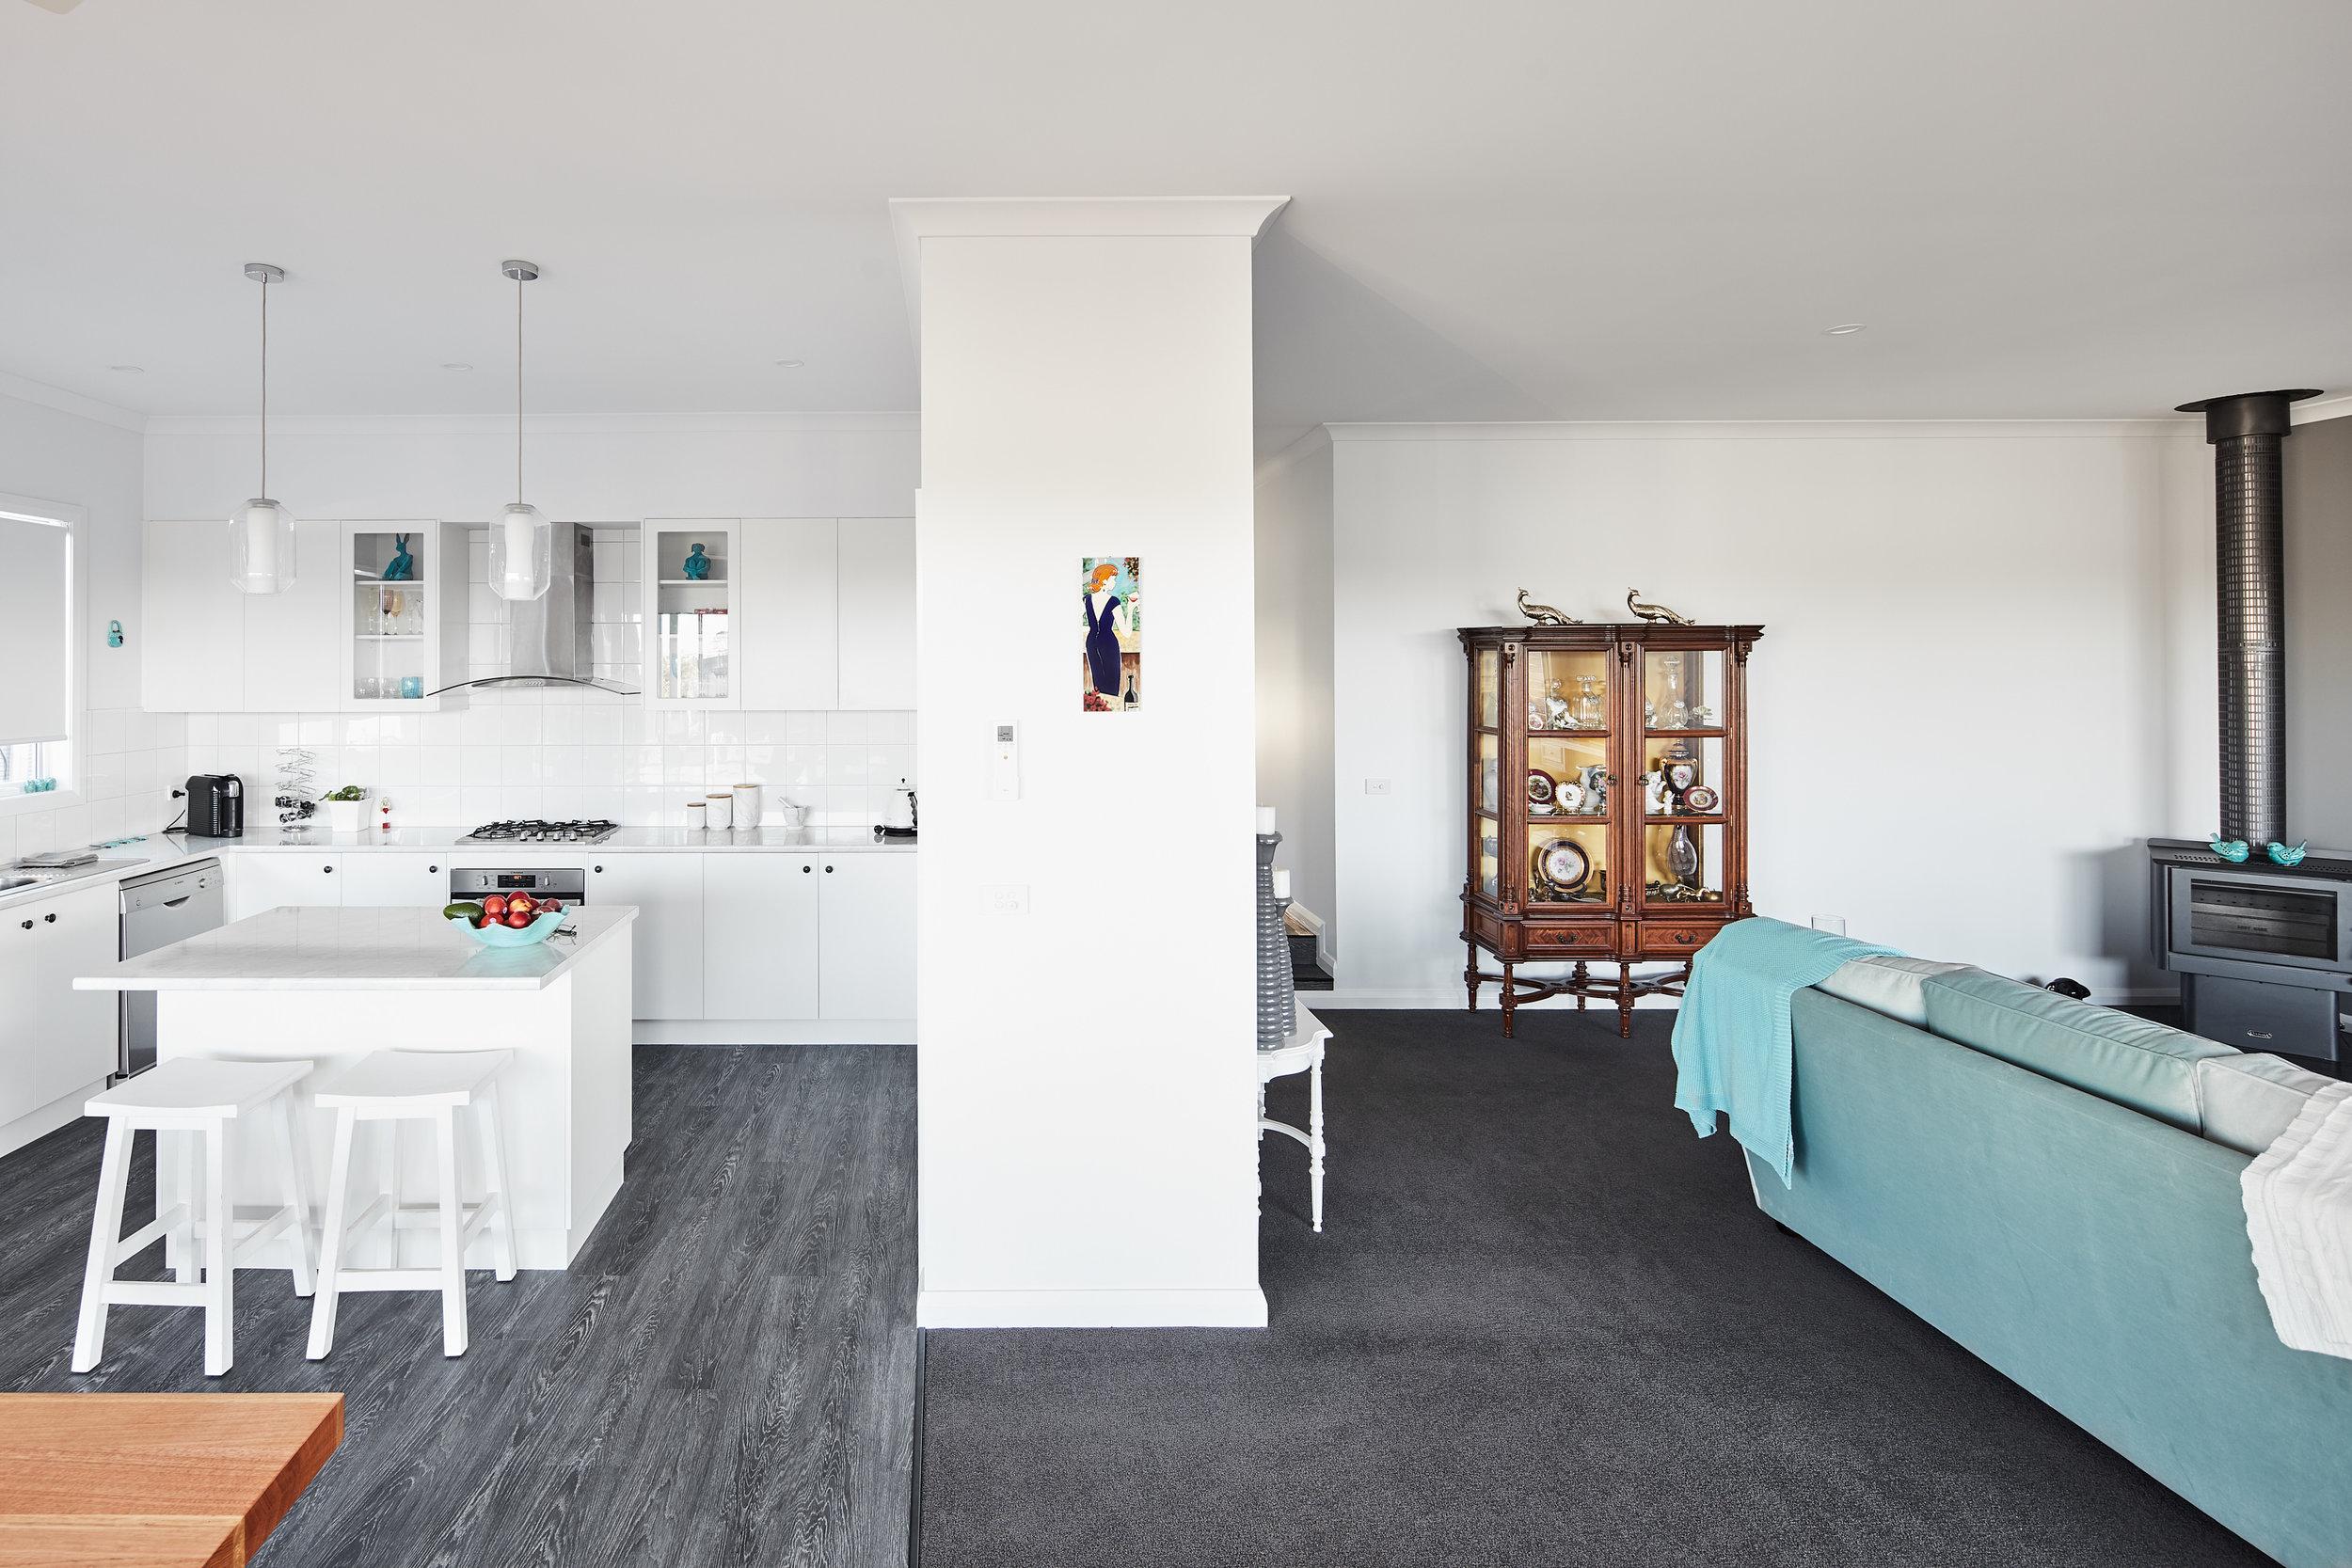 nathan-k-davis-nathankdavis-1nkd-architectural-photography-melbourne-victoria-australia-residential-3